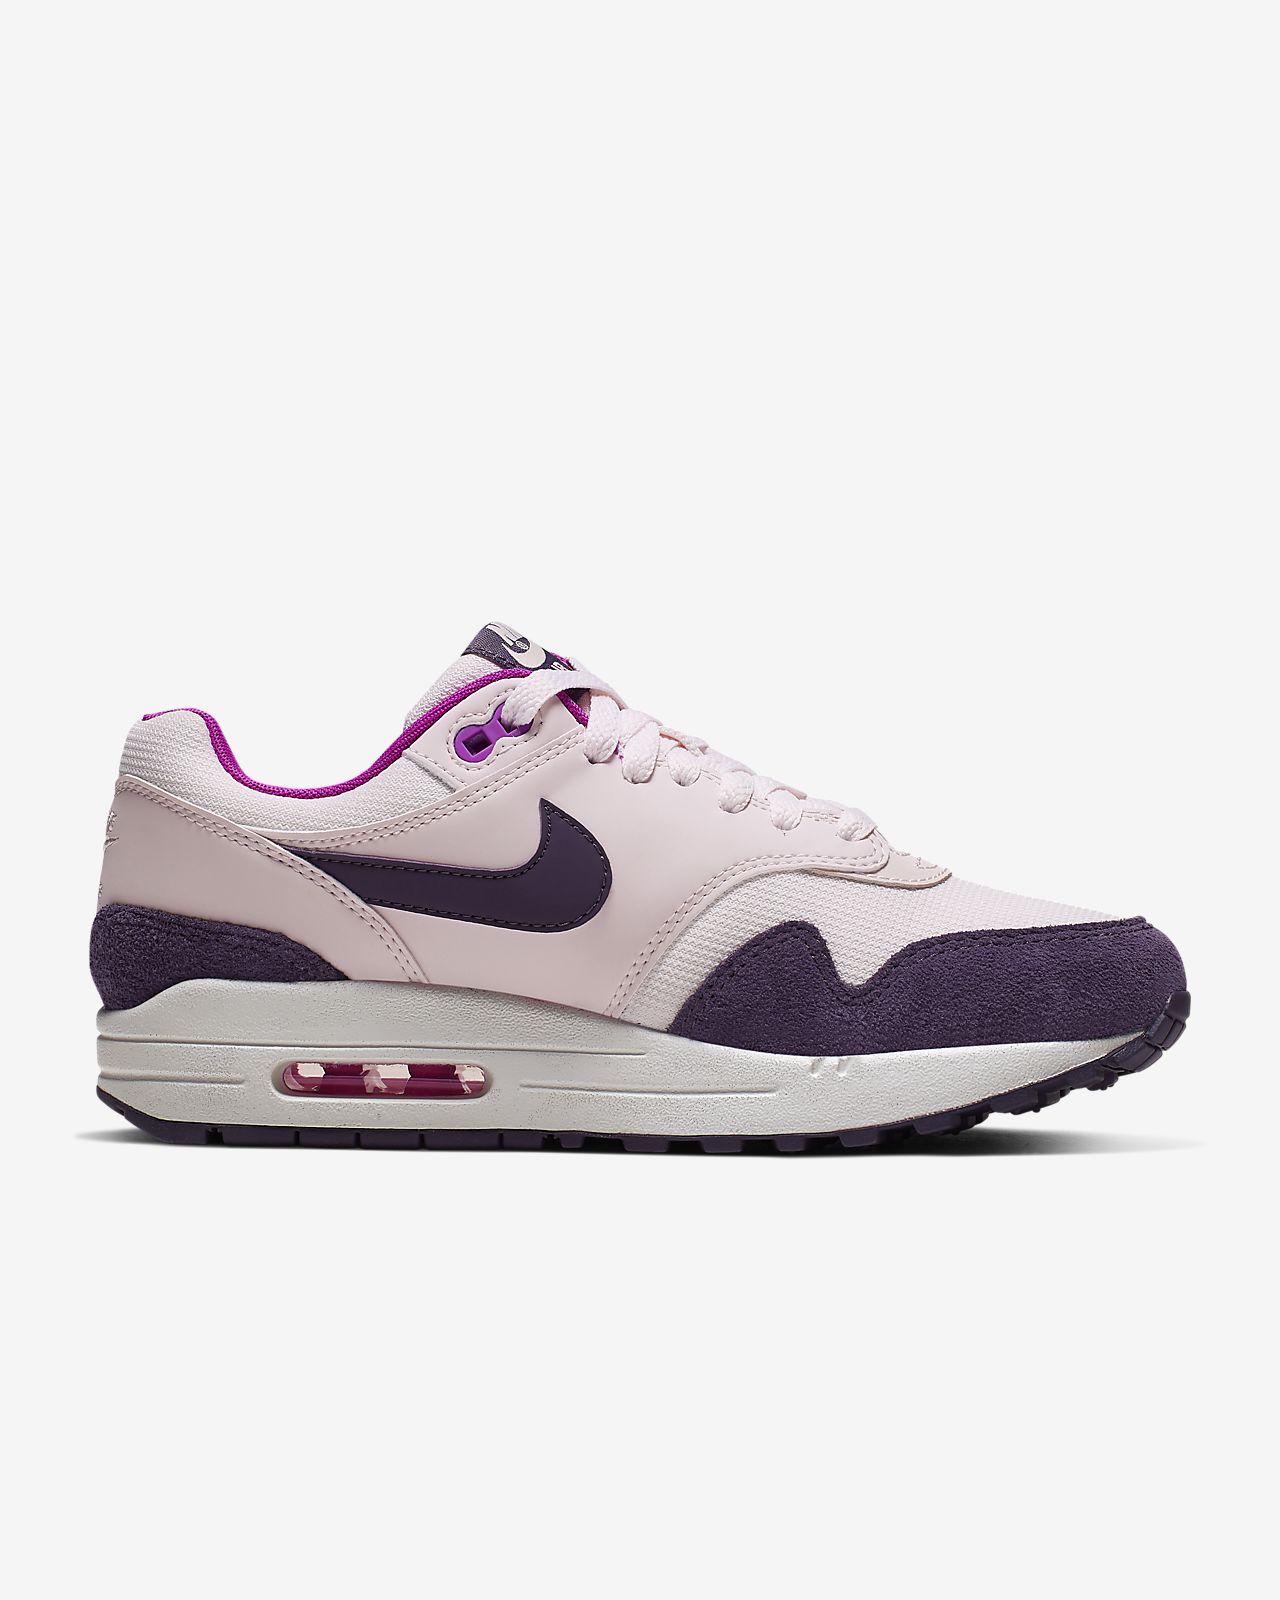 dirt cheap new style temperament shoes Nike Air Max 1 Women's Shoe